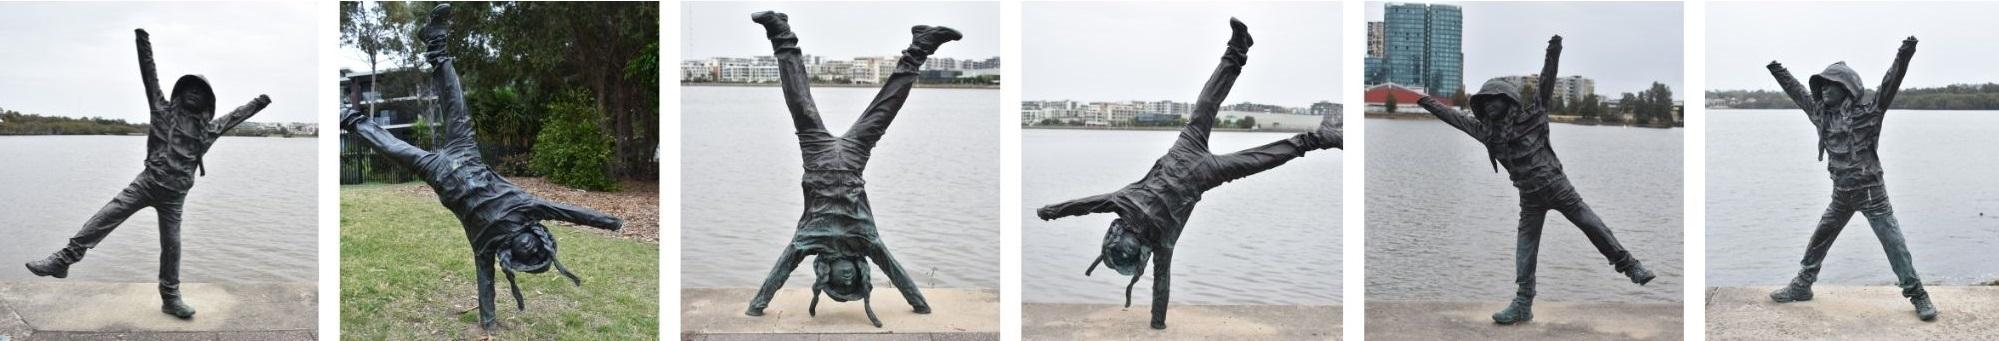 Rhodes Public Art   'Cartwheeling Youngster' Sculpture by Caroline Rothwell